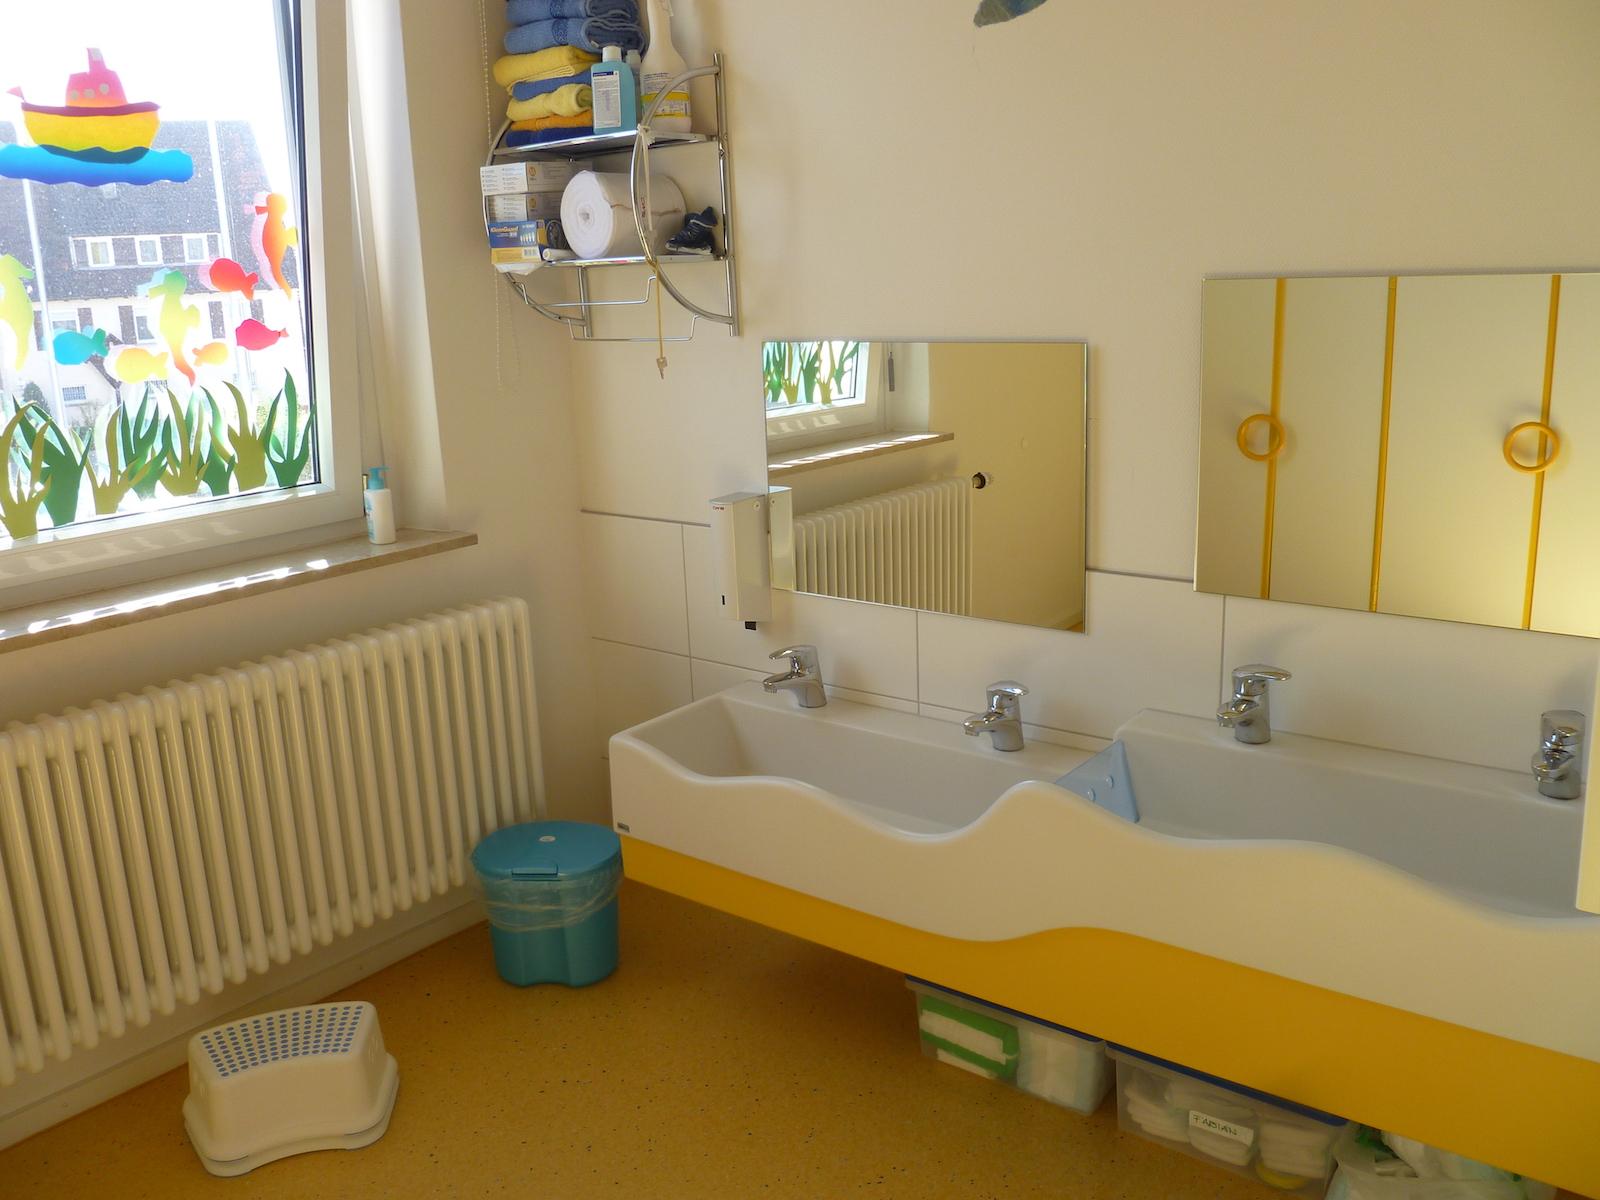 r ume kindergartengruppe kiga ottenbach. Black Bedroom Furniture Sets. Home Design Ideas